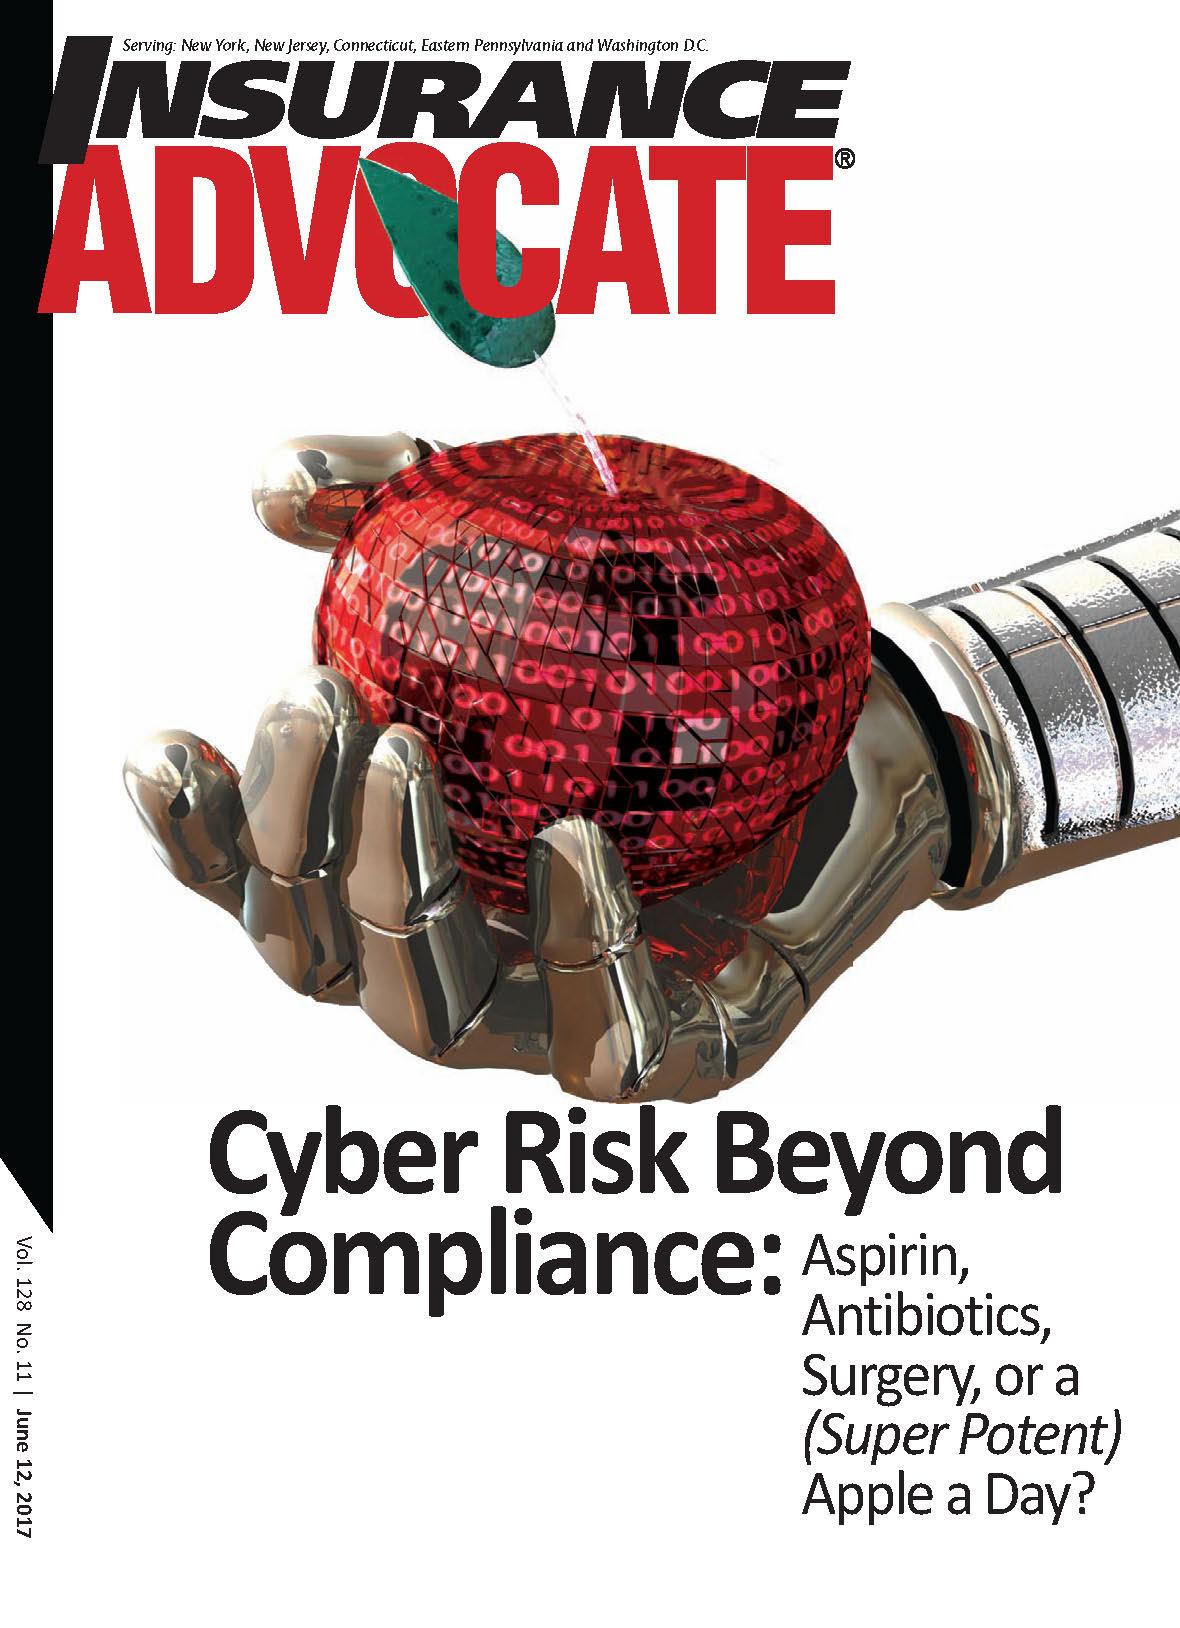 The Magazine | Insurance Advocate